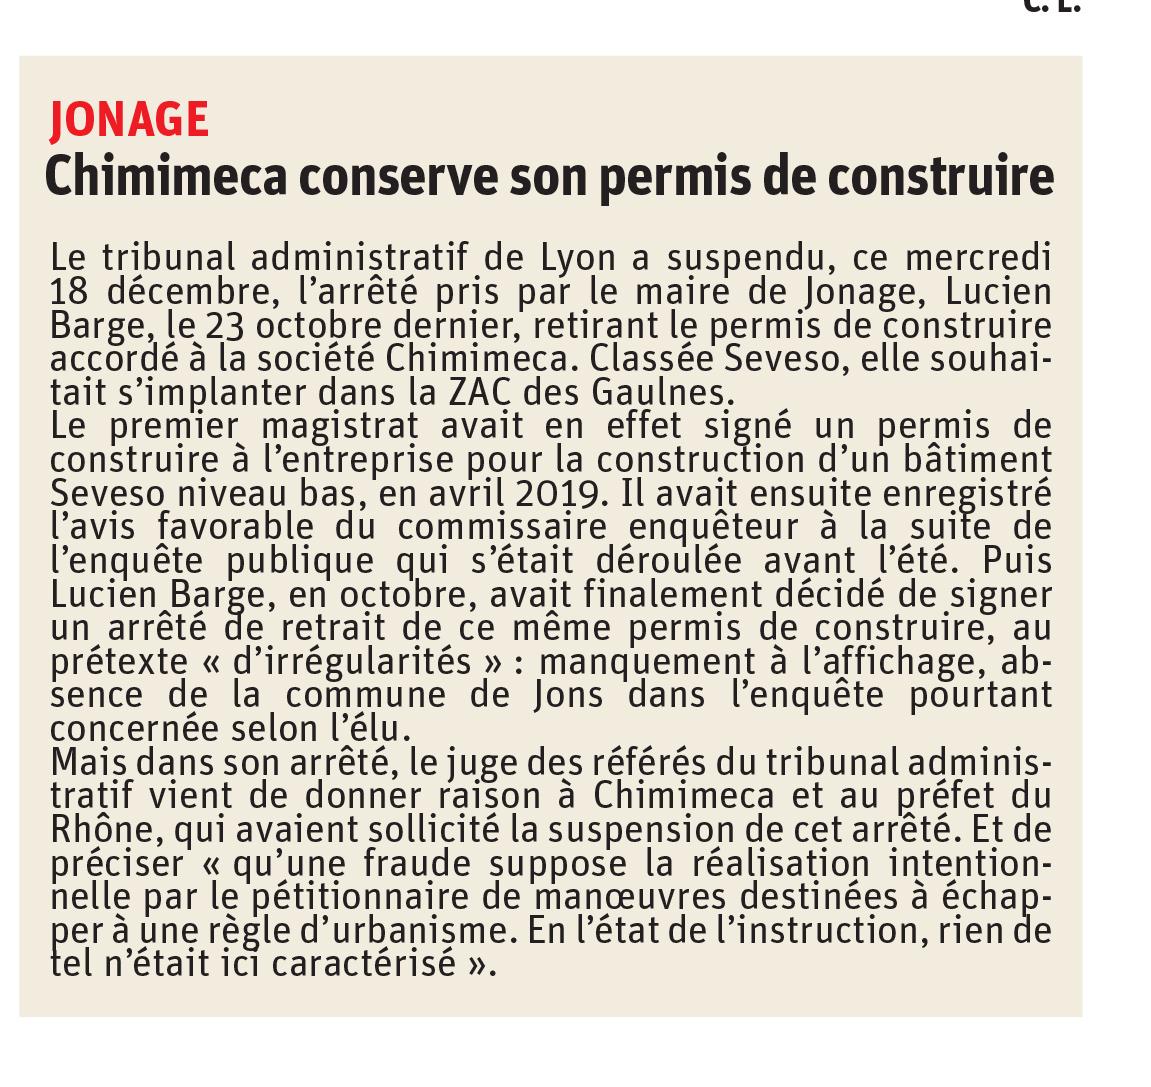 CHIMIMECA